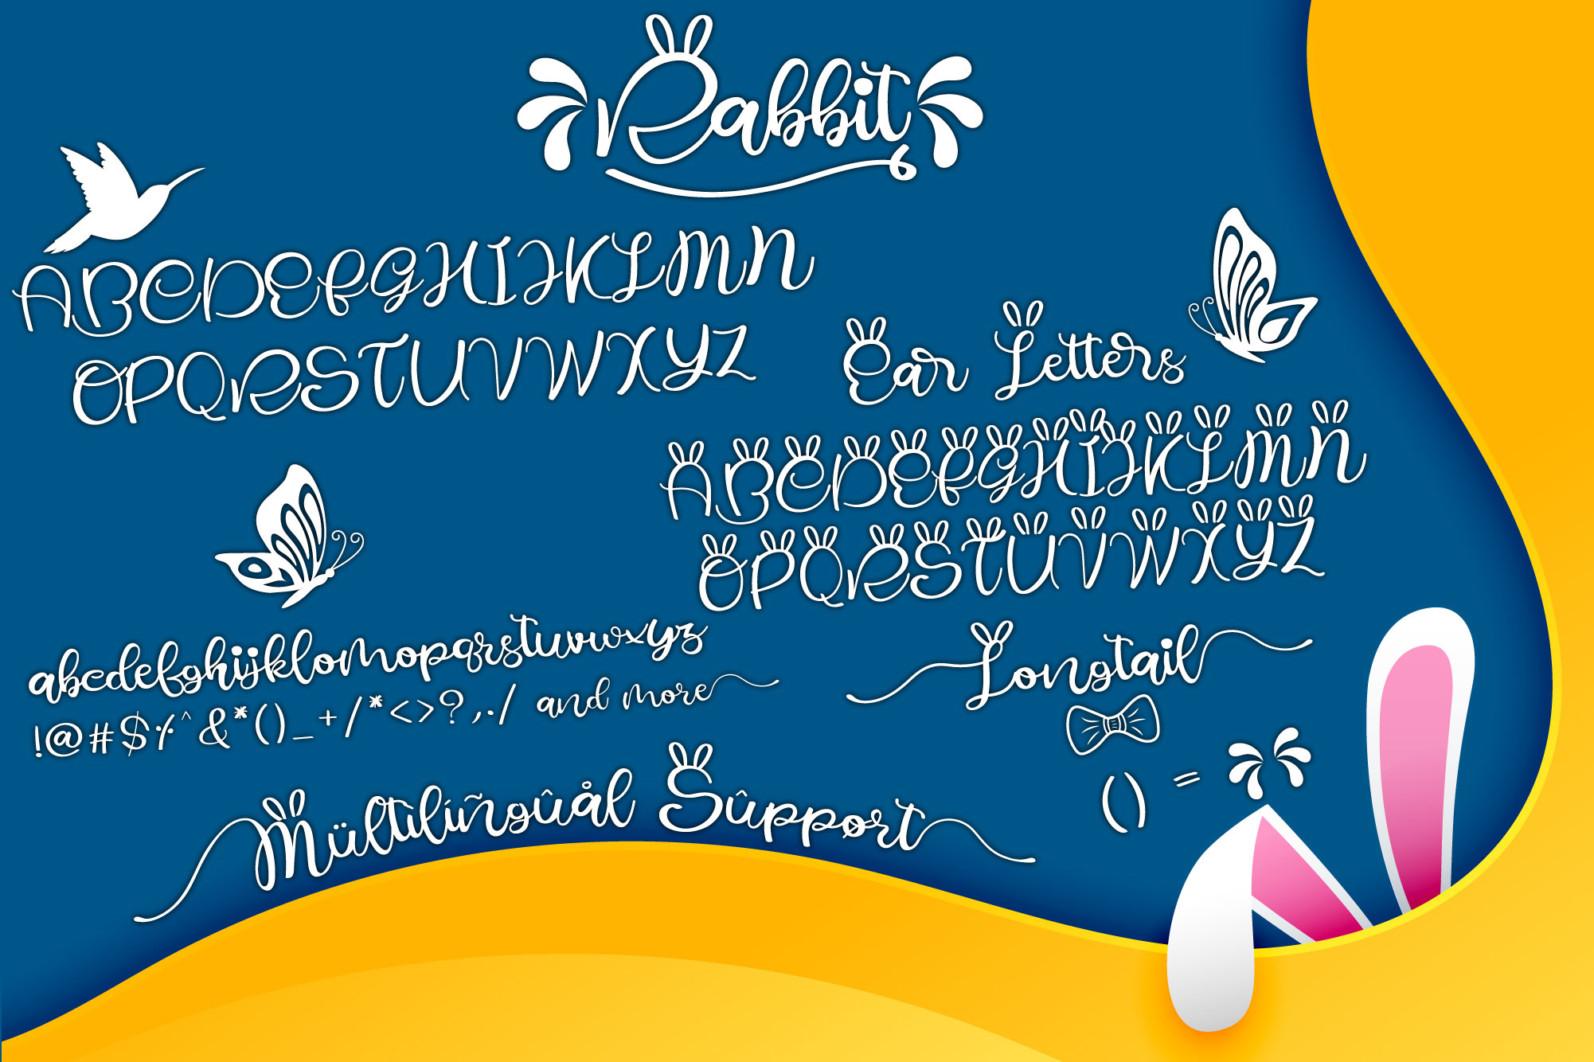 Rabbit - Rabbit display6 -